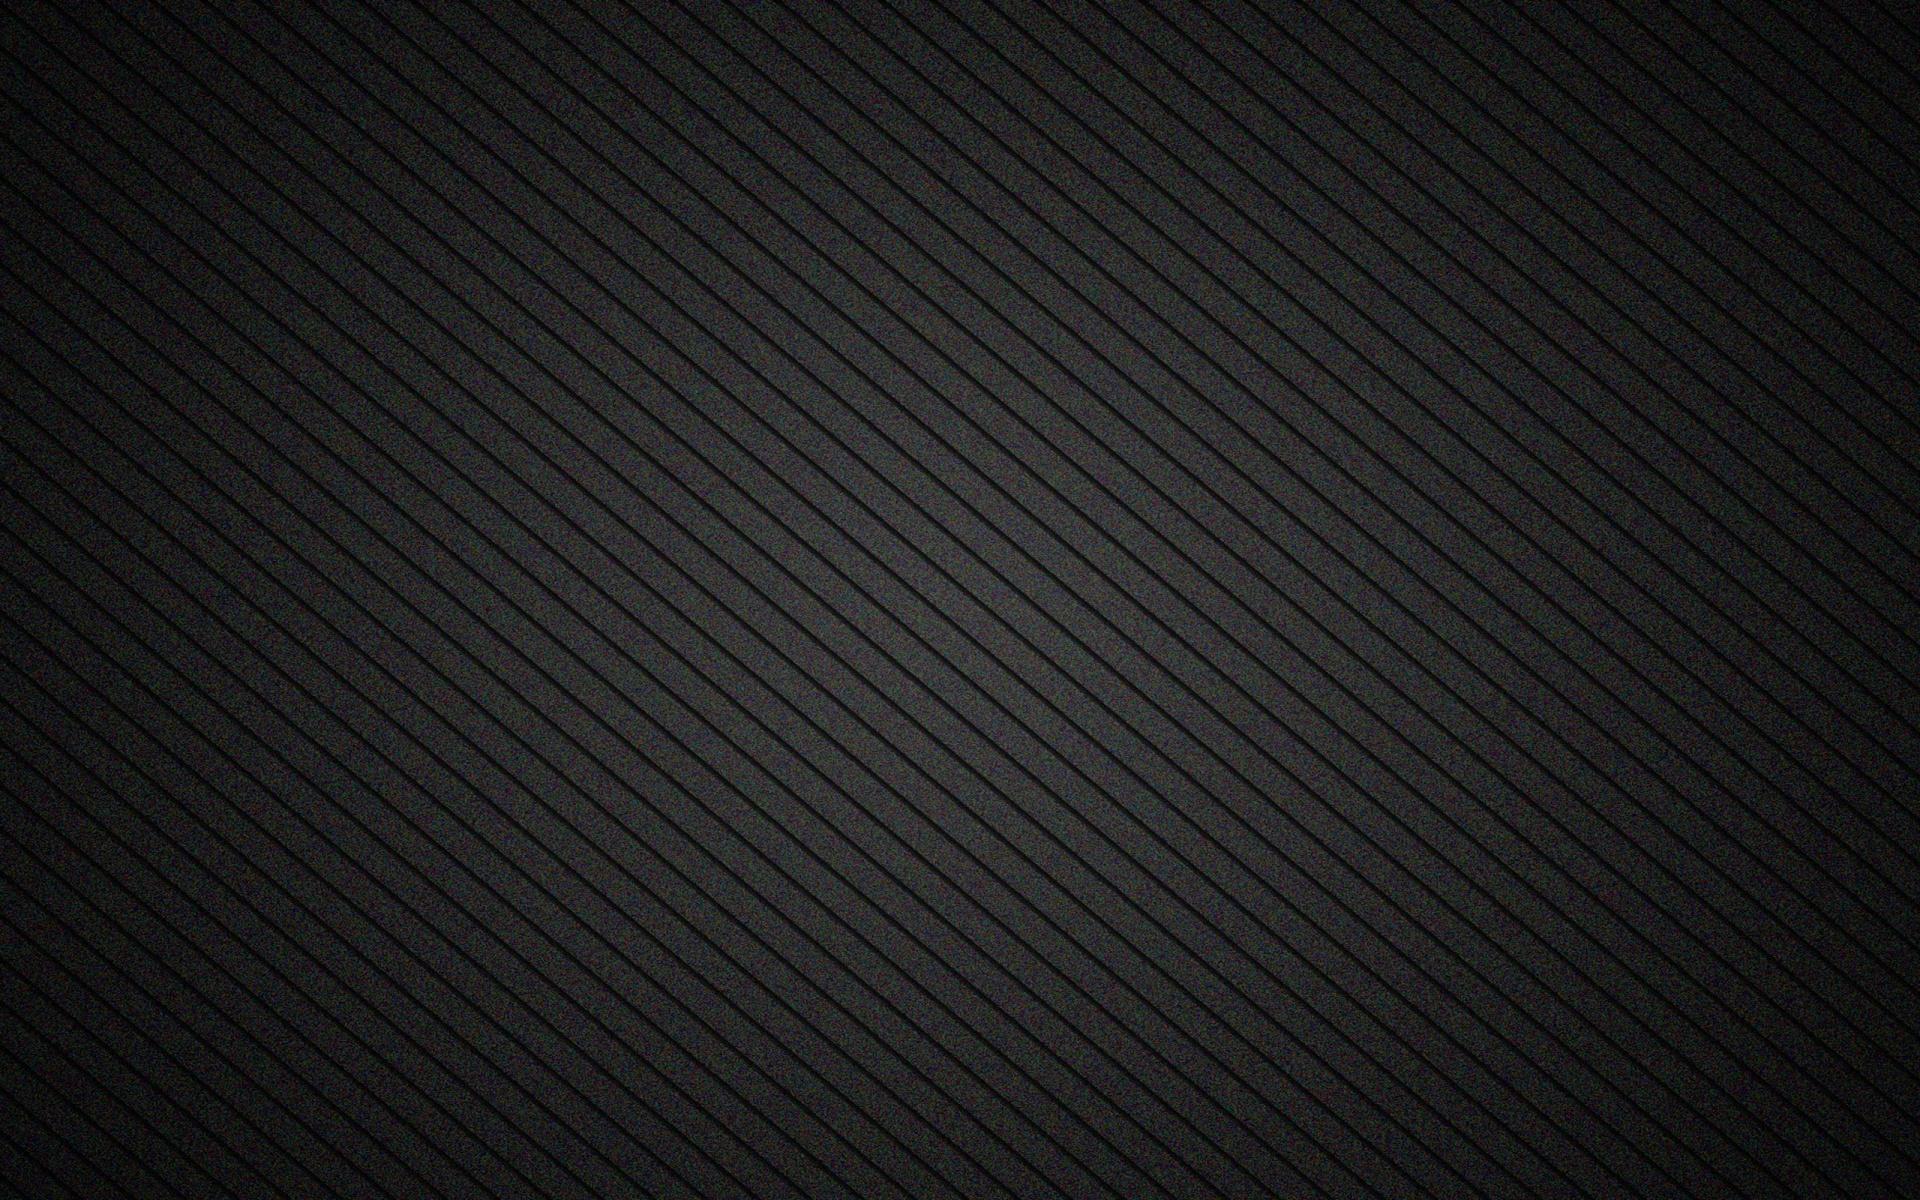 black-wallpaper-30.jpg